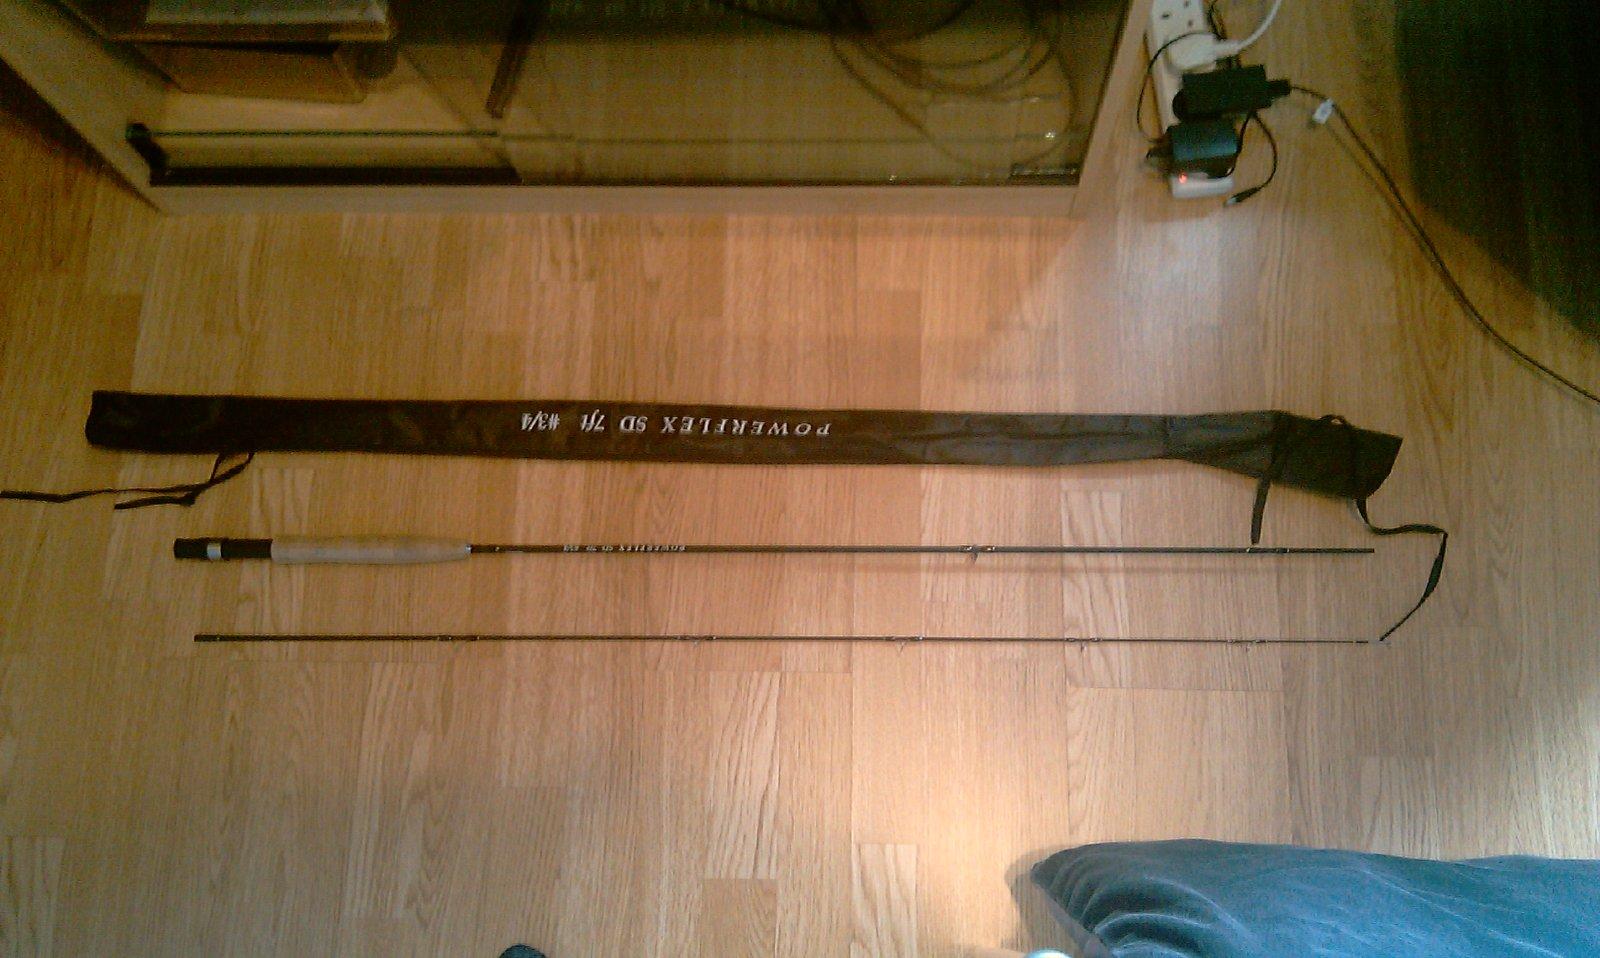 Powerflex 7ft Fly Fishing Rod.-upueo.jpg